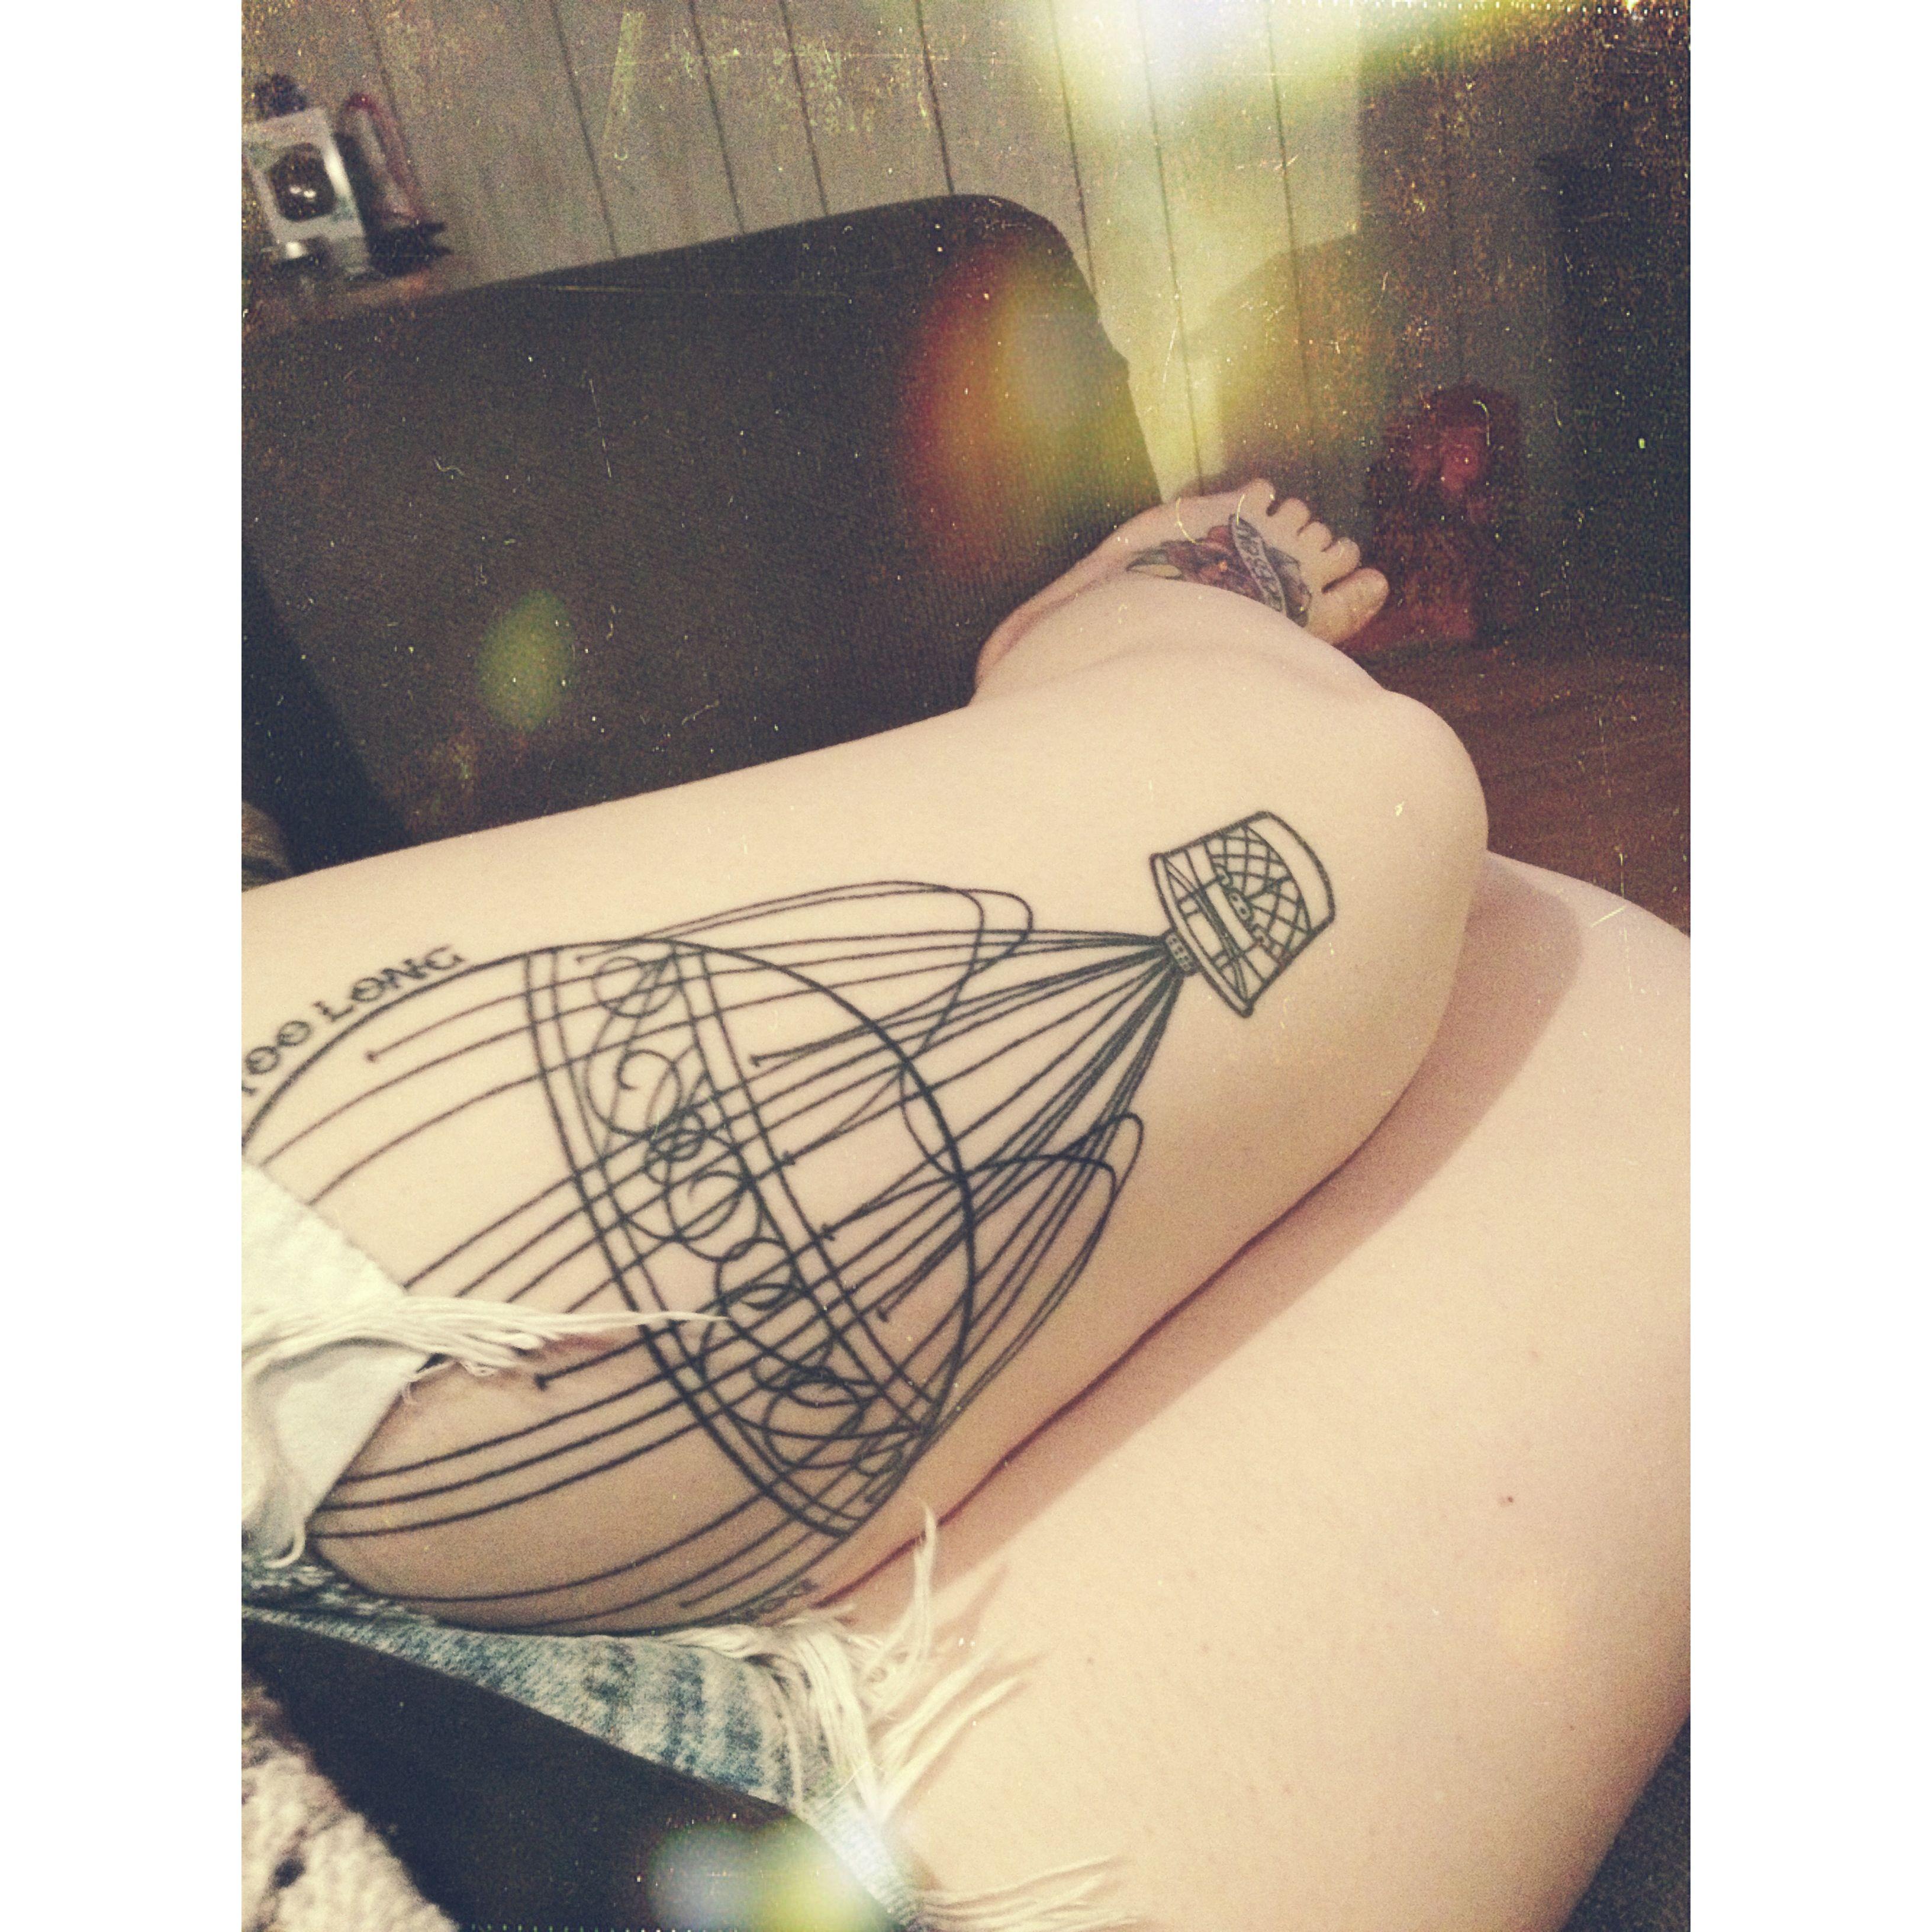 Hot air balloon tattoo #tattoo | Tattoos | Pinterest